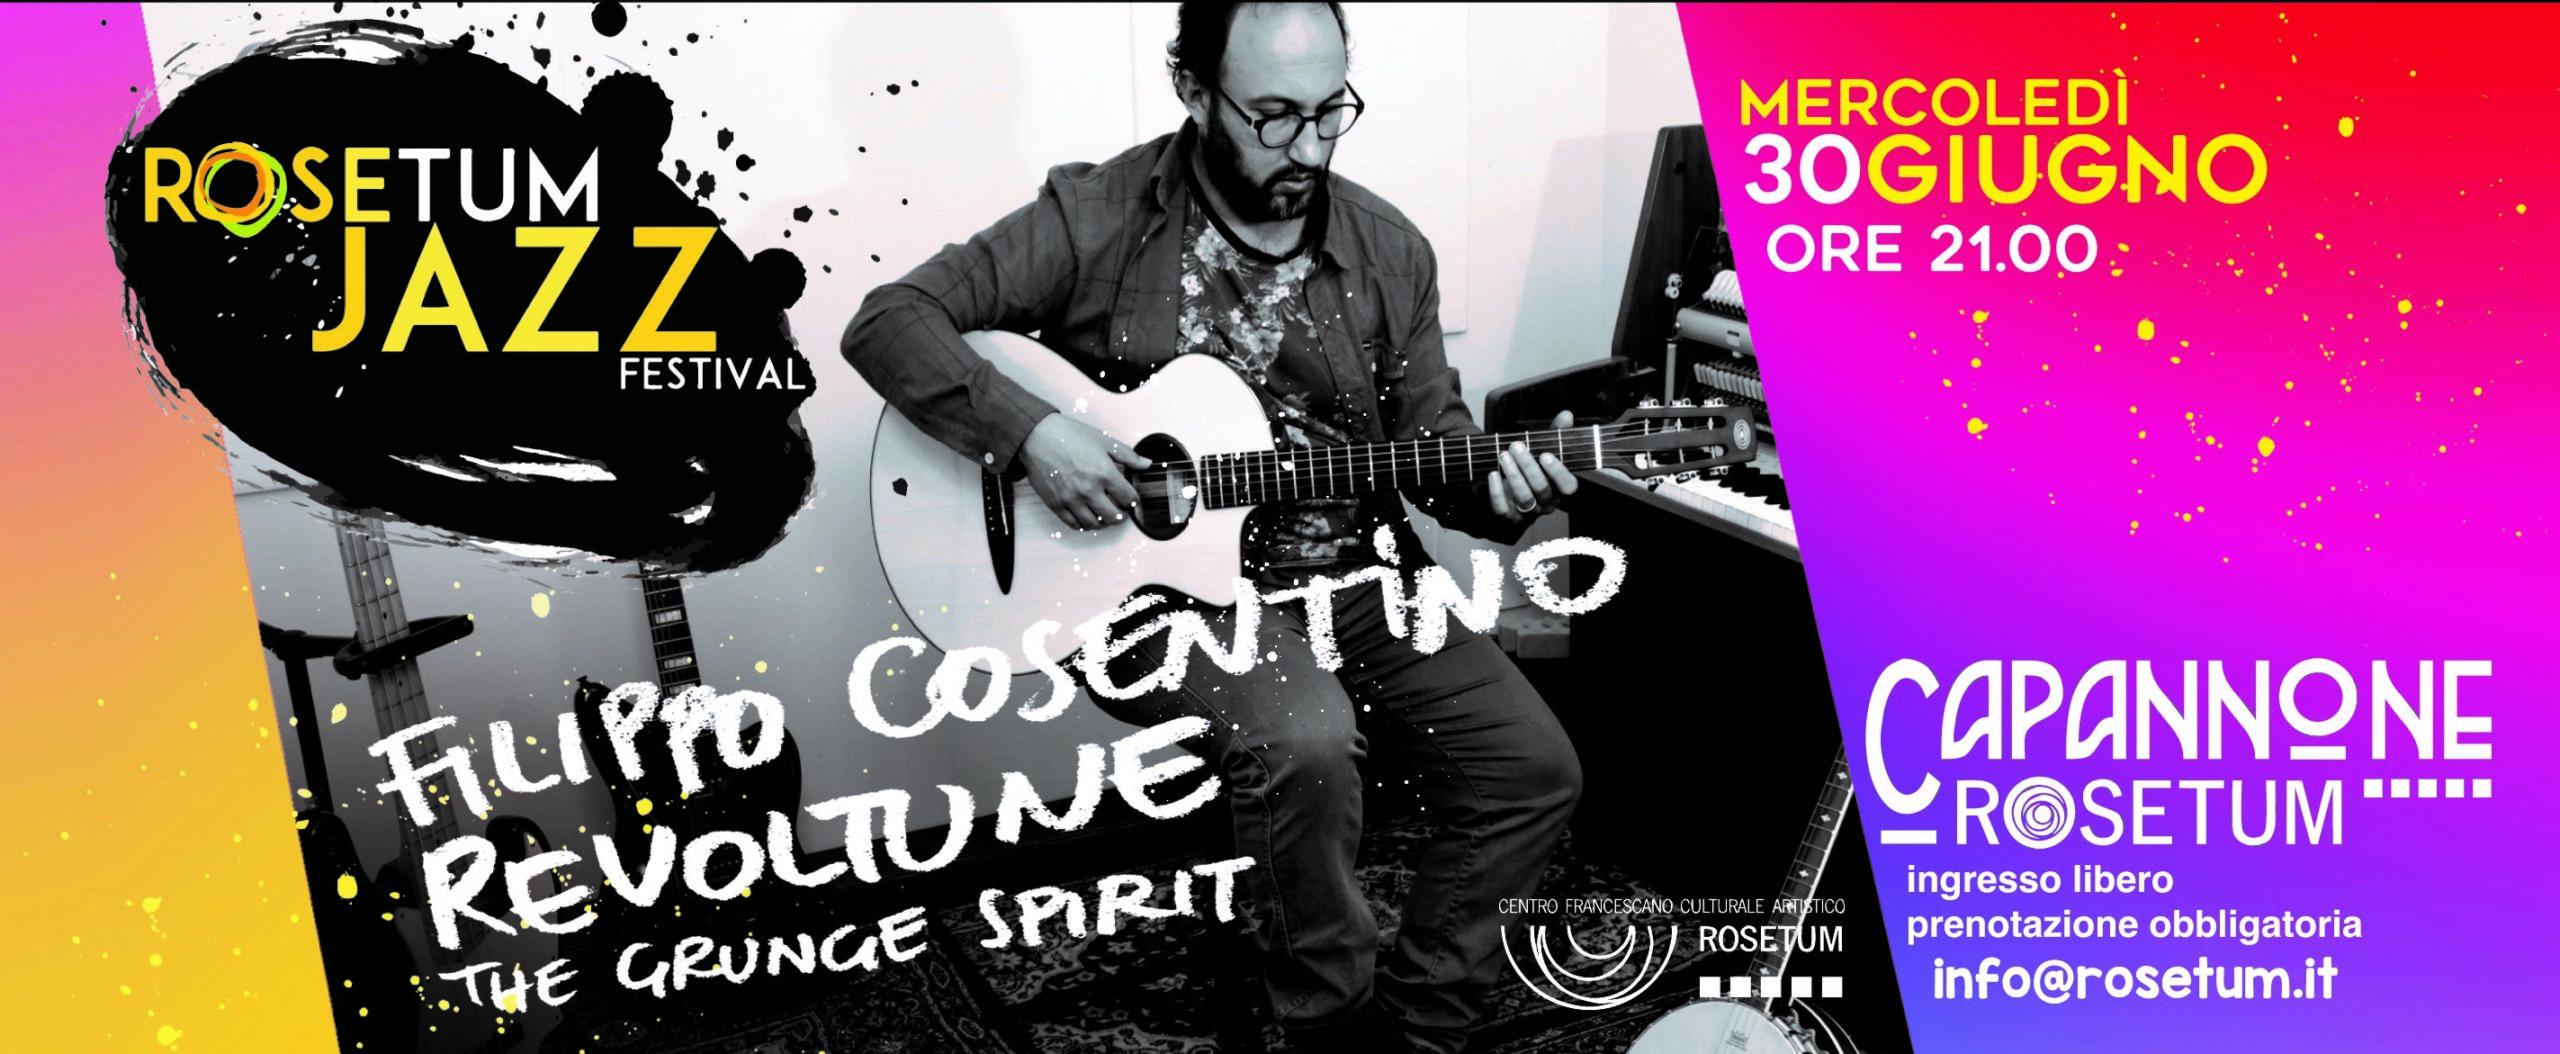 Filippo Cosentino Rosetum Jazz Festival 30 giugno 2021